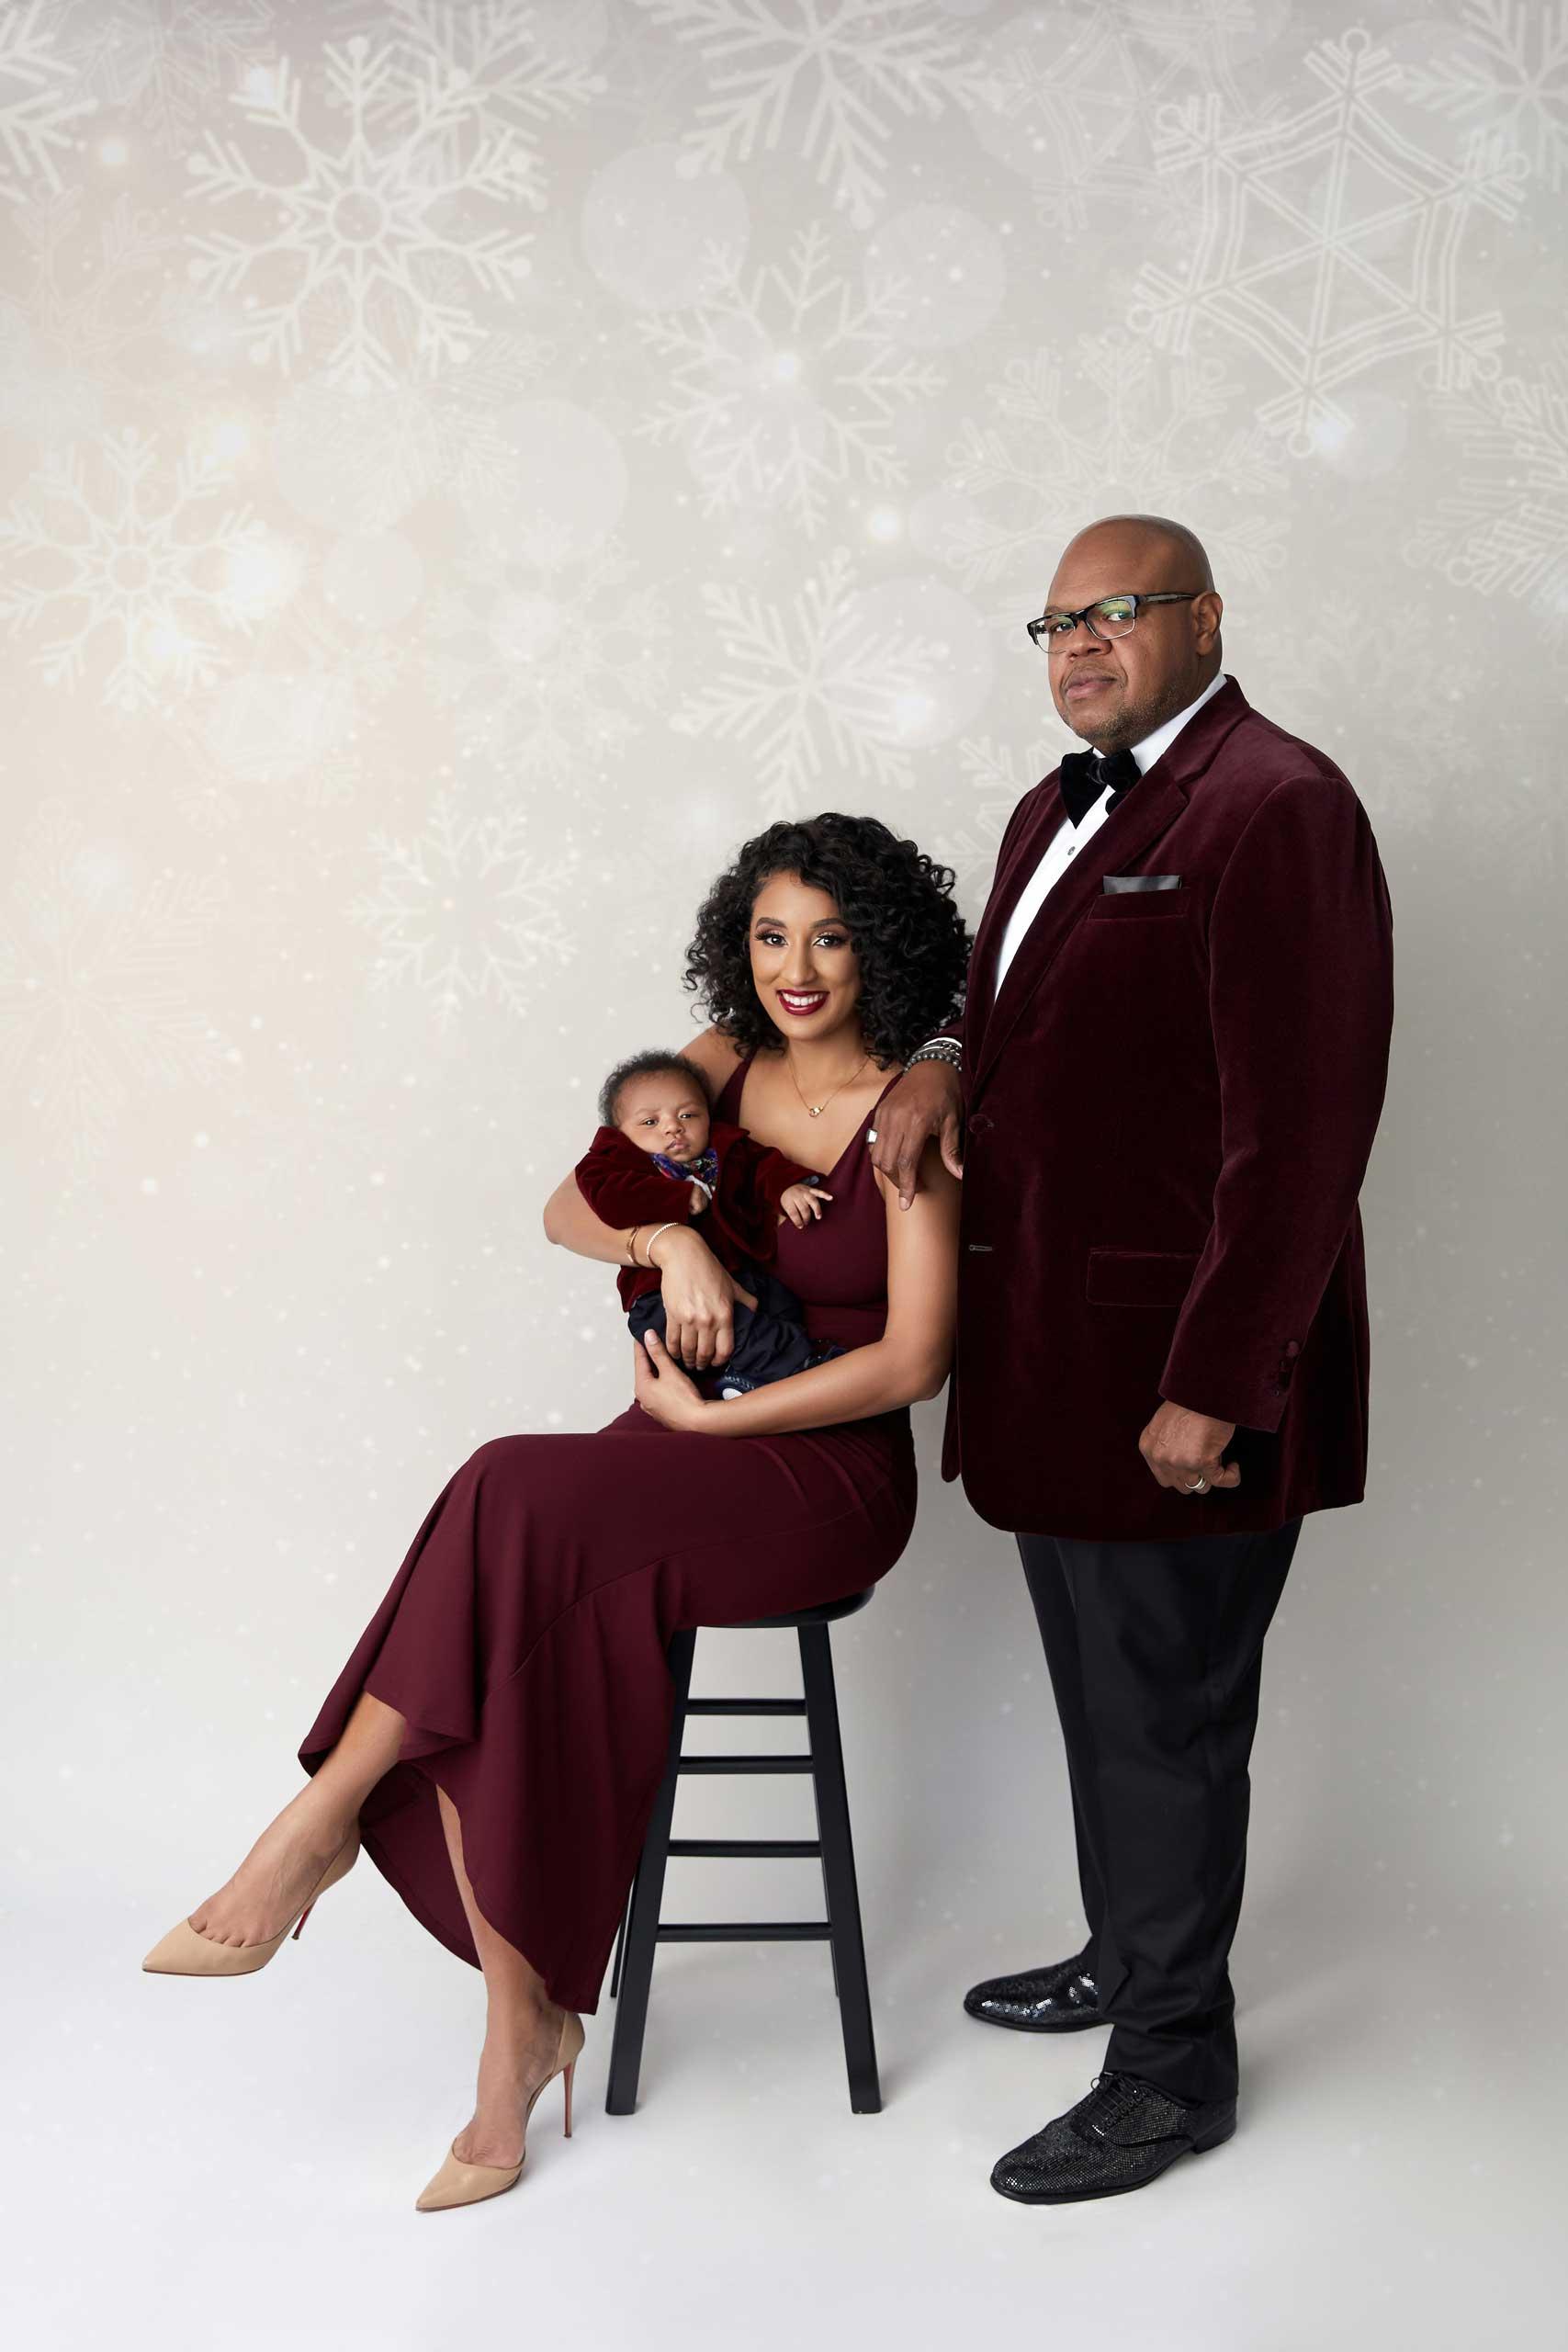 Family photoshoot in Los Angeles by Ramina Magid